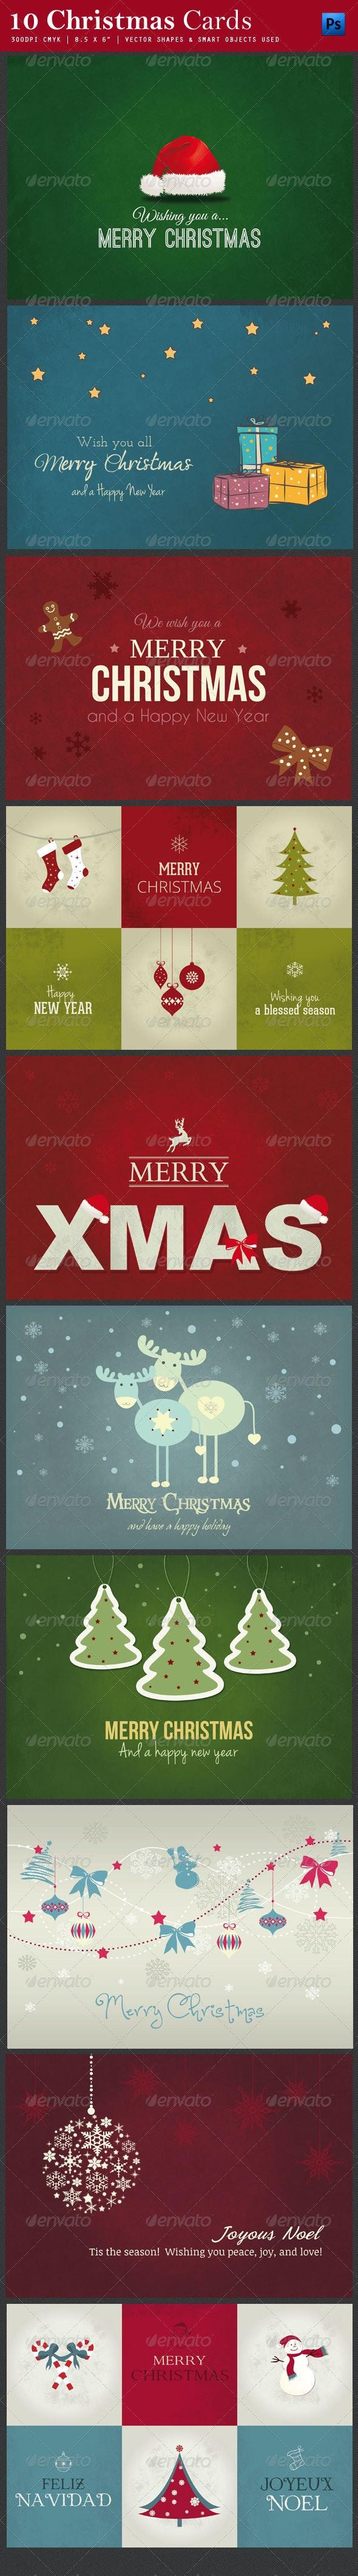 10 Christmas Cards PSD - Cards & Invites Print Templates